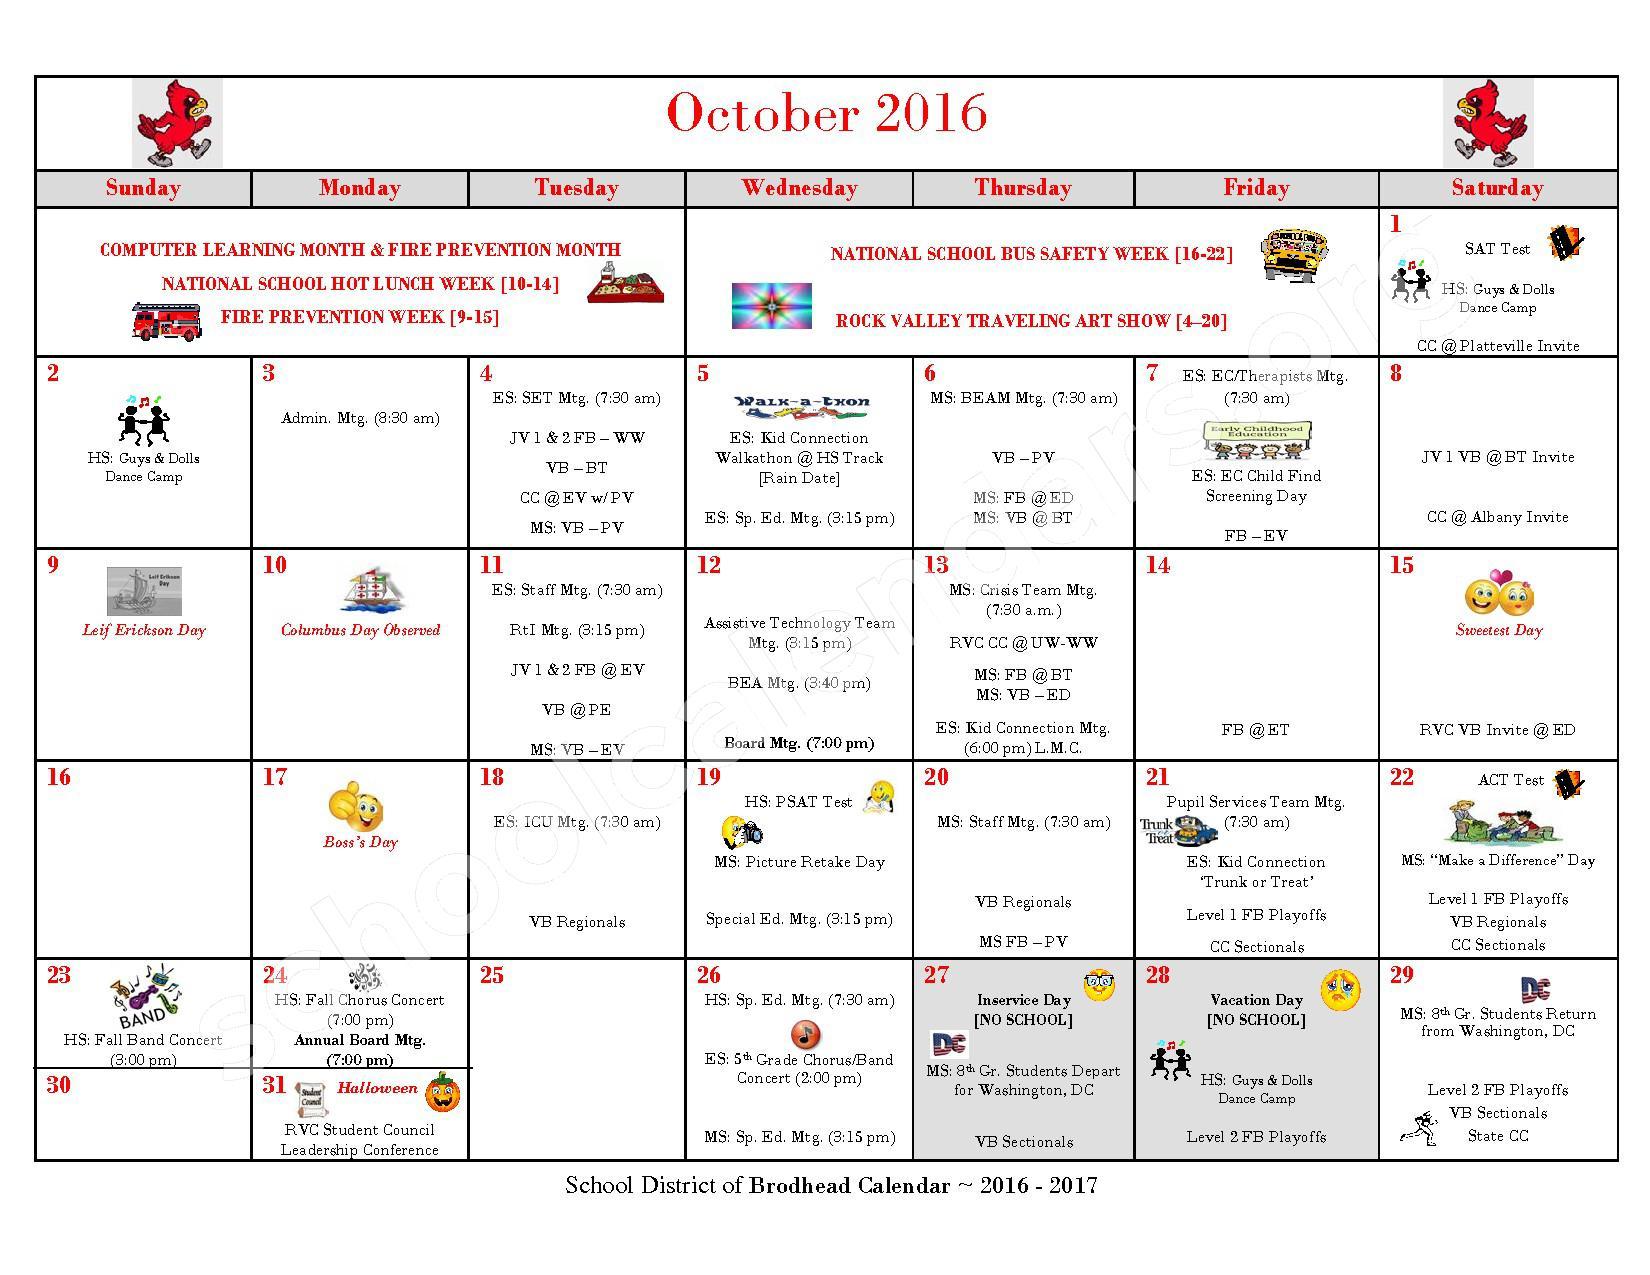 2016 - 2017 School Calendar – Brodhead School District – page 3